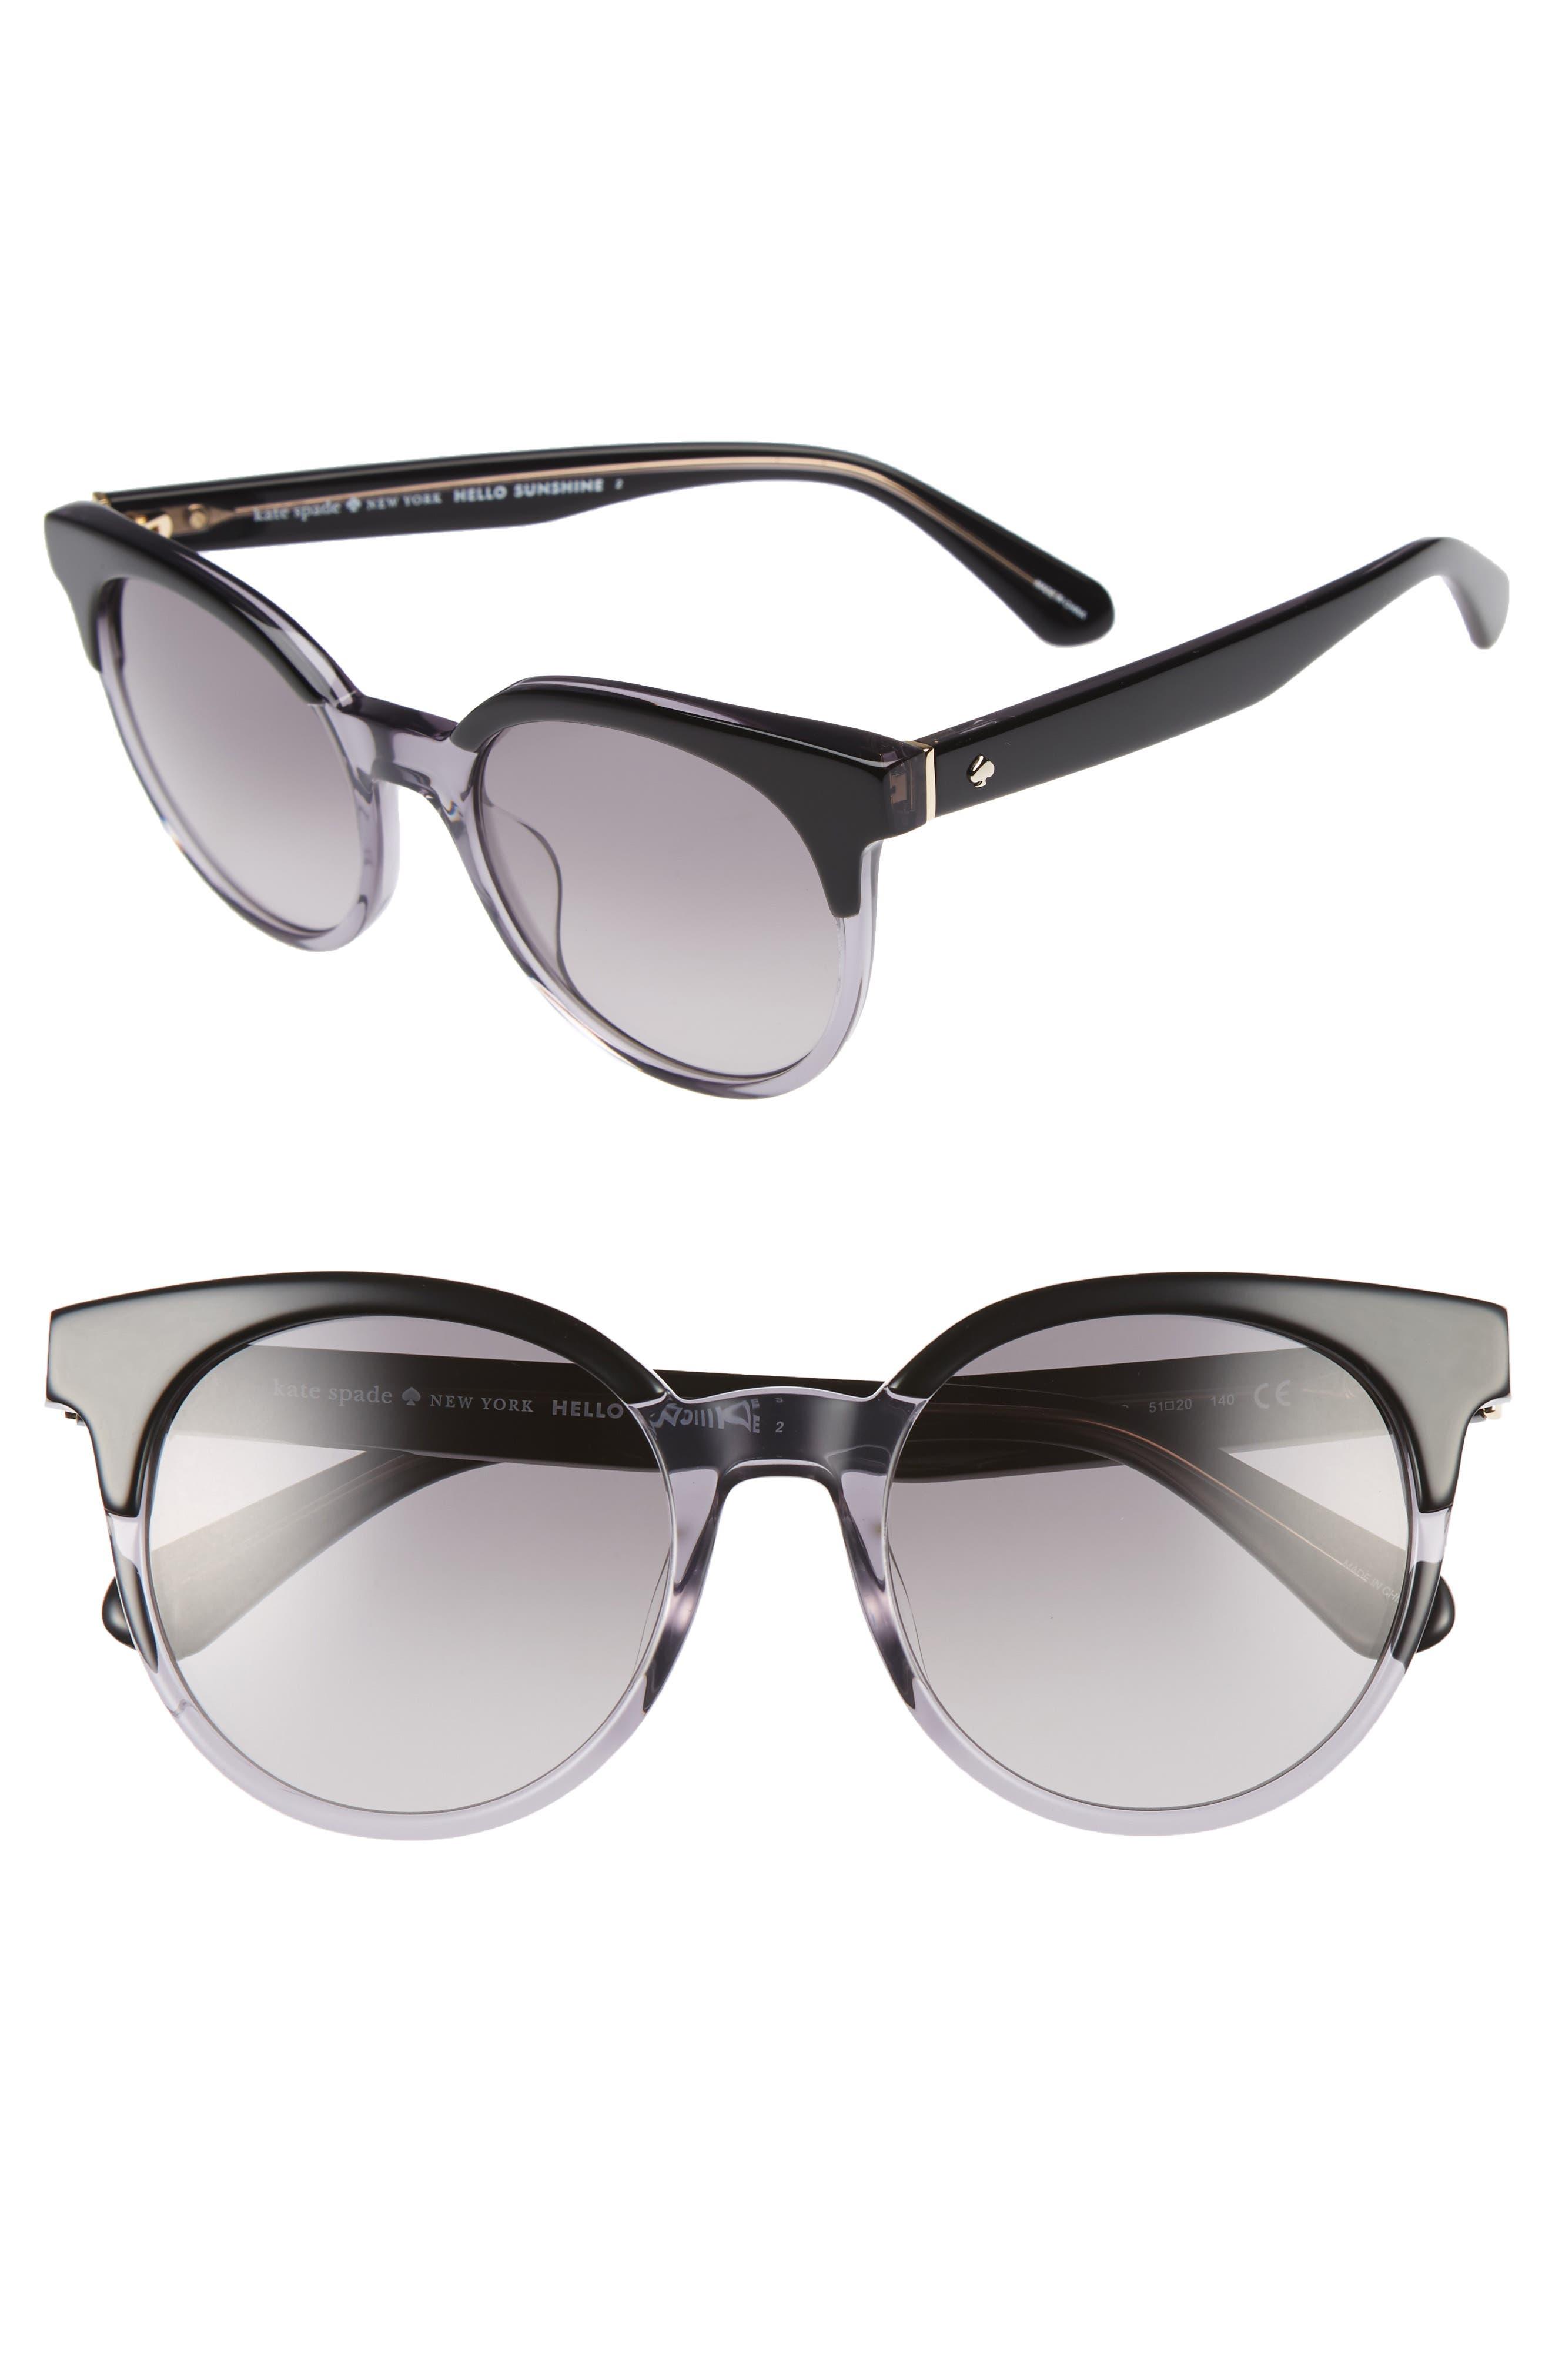 abianne 51mm round sunglasses,                             Main thumbnail 1, color,                             Black/ Grey